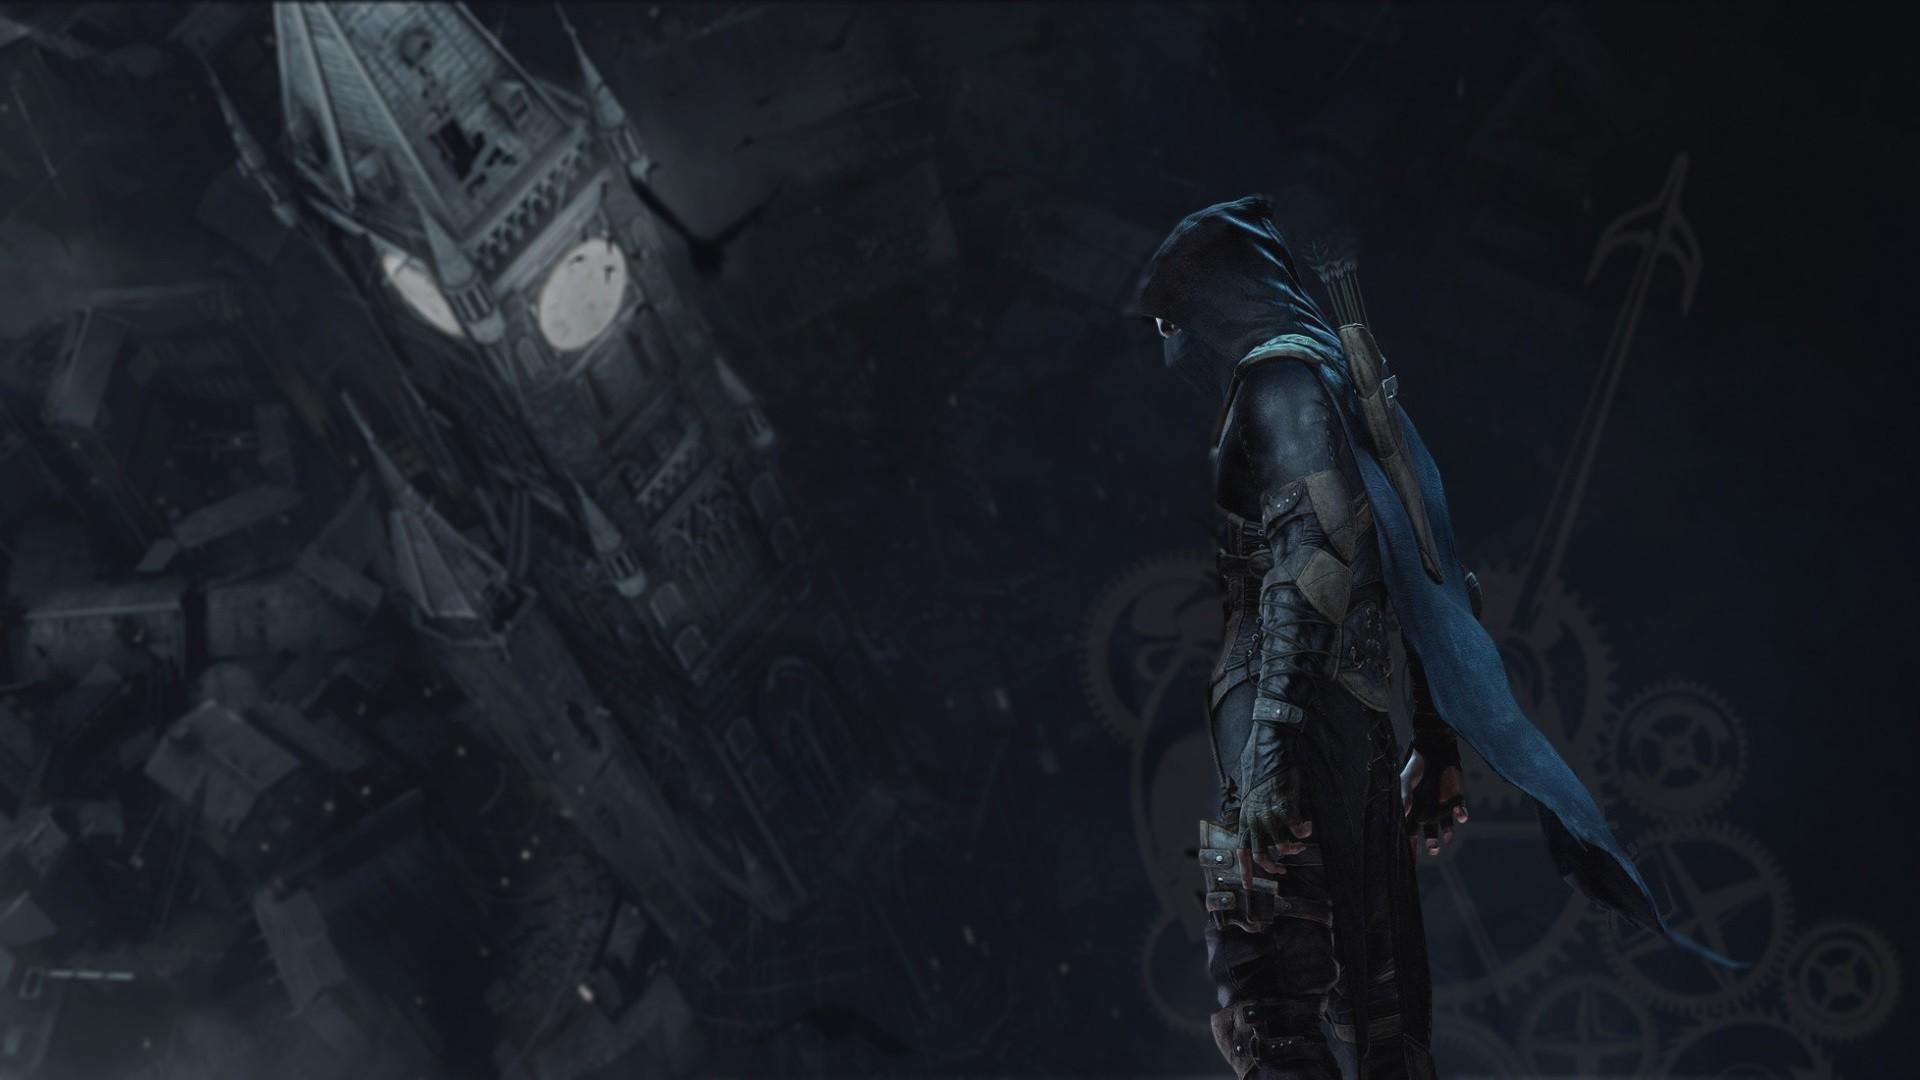 wallpaper : video games, city, gloves, hoods, thief, ninjas